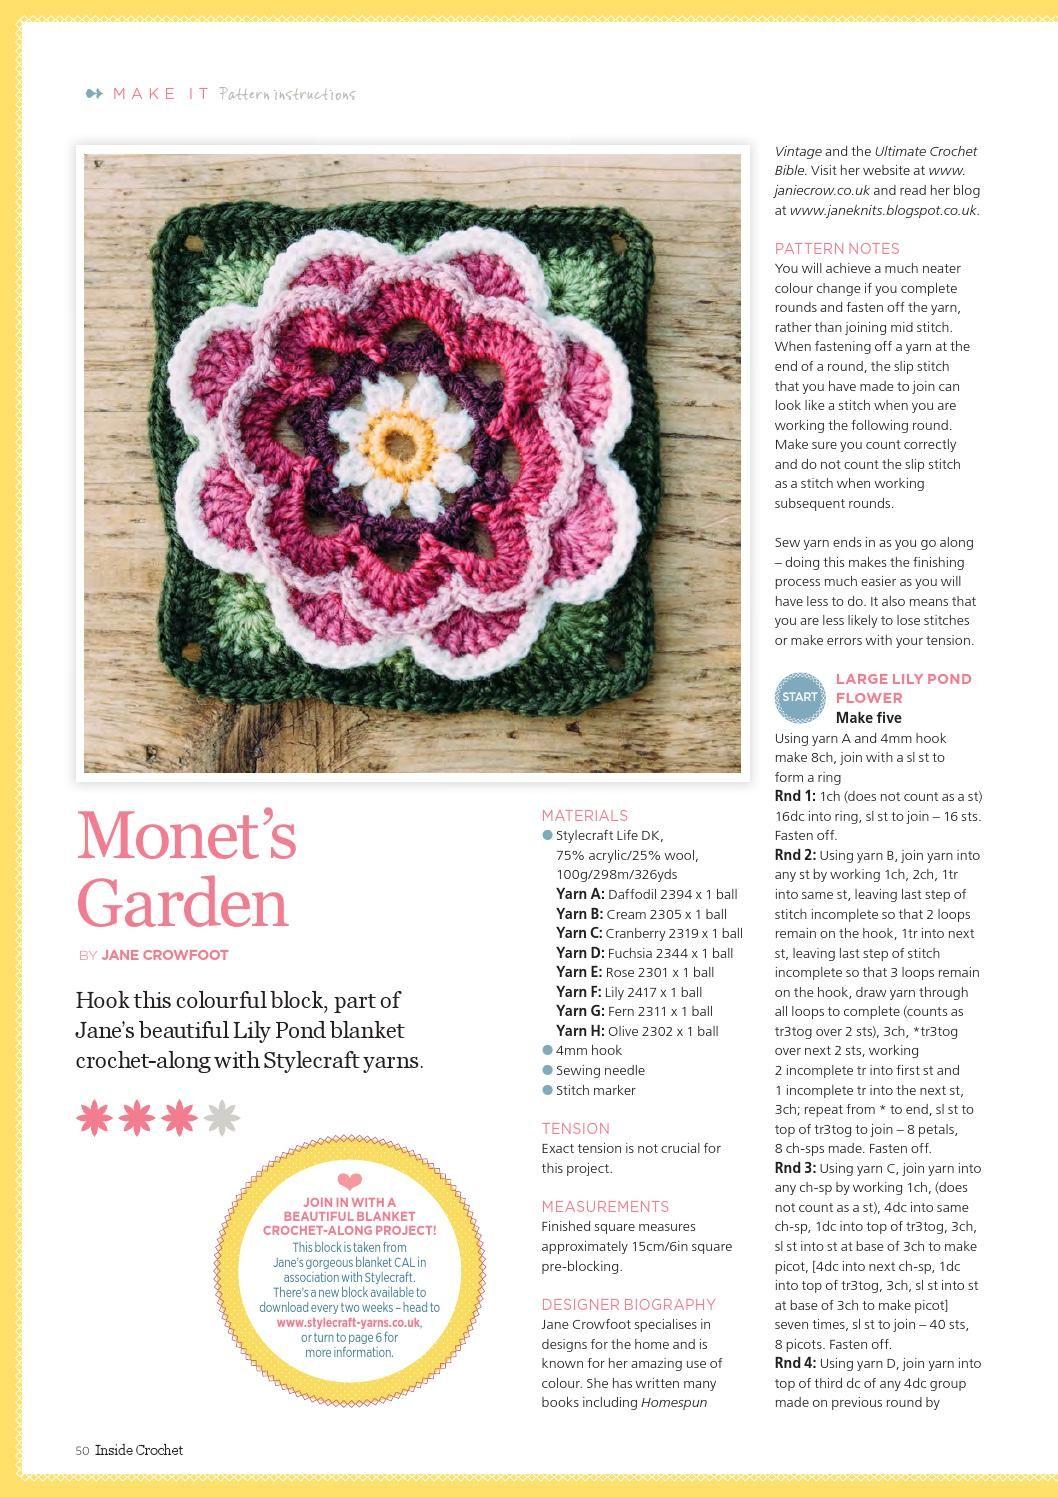 Issuu Inside Crochet Issue 65 2015 By Camelia July Crochet Granny Square Crochet Pattern Crochet Blanket Blocking